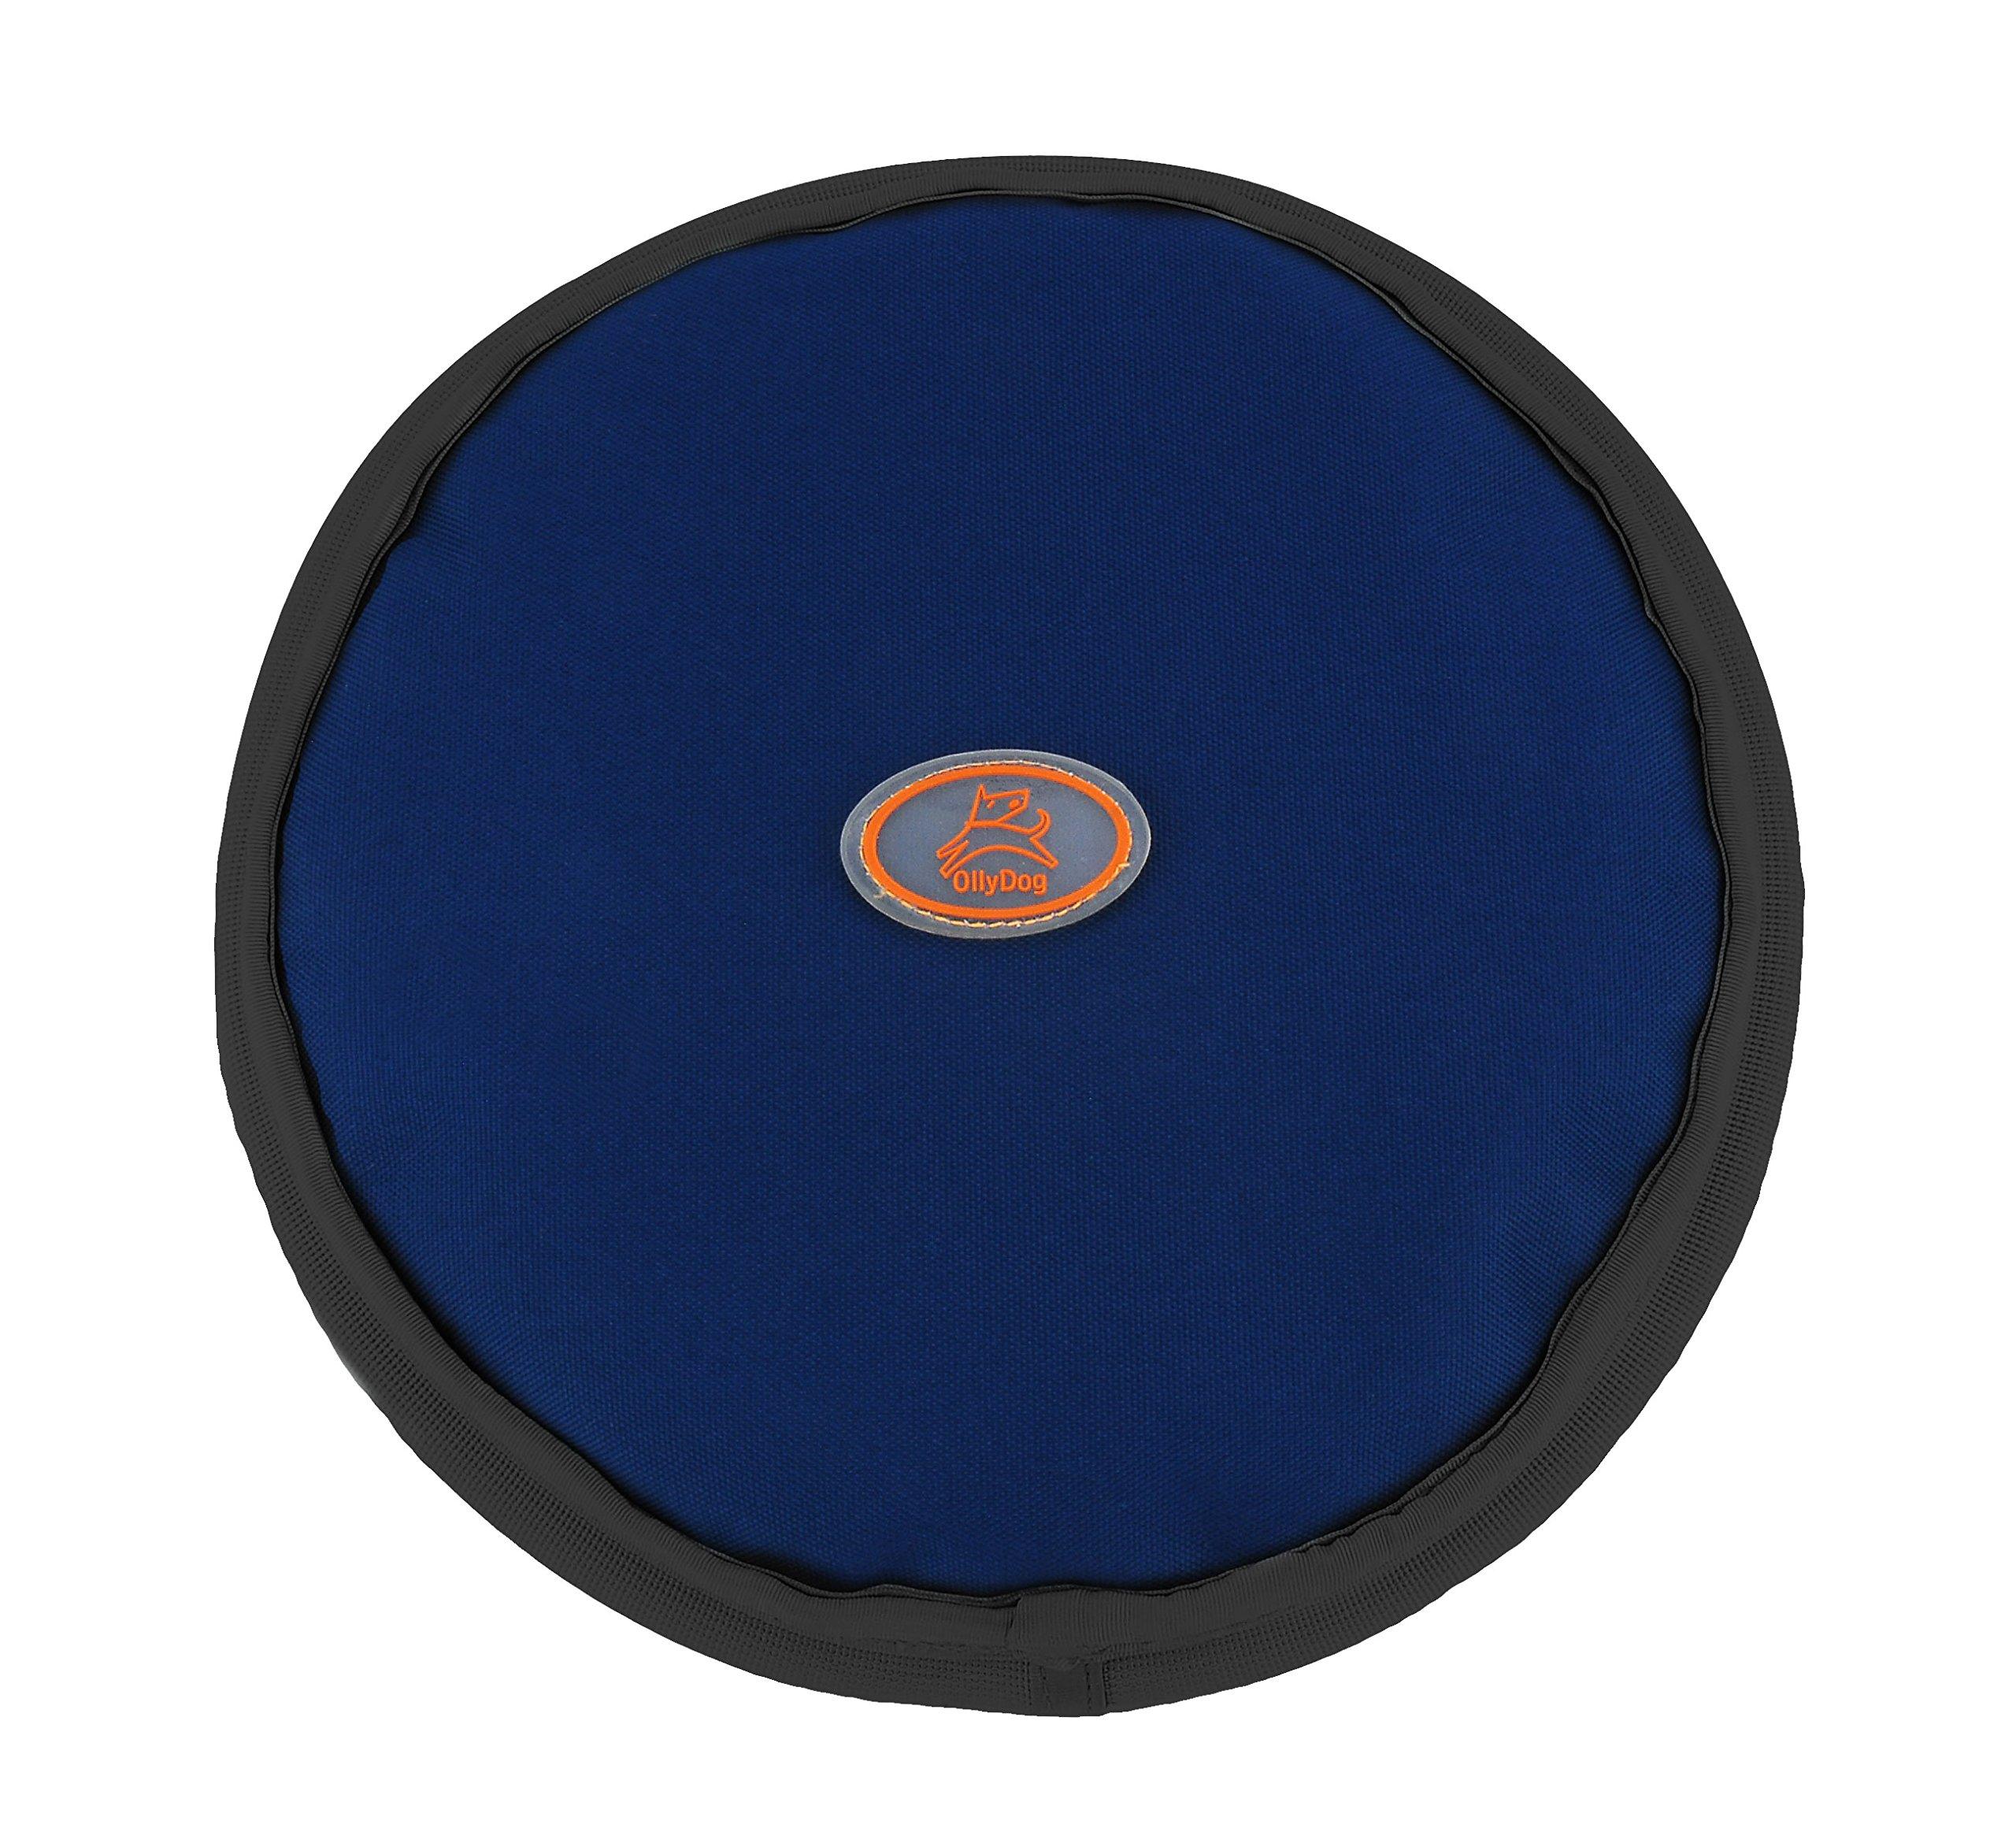 OllyDog OllyFlyer Flying Disc, Large, Navy